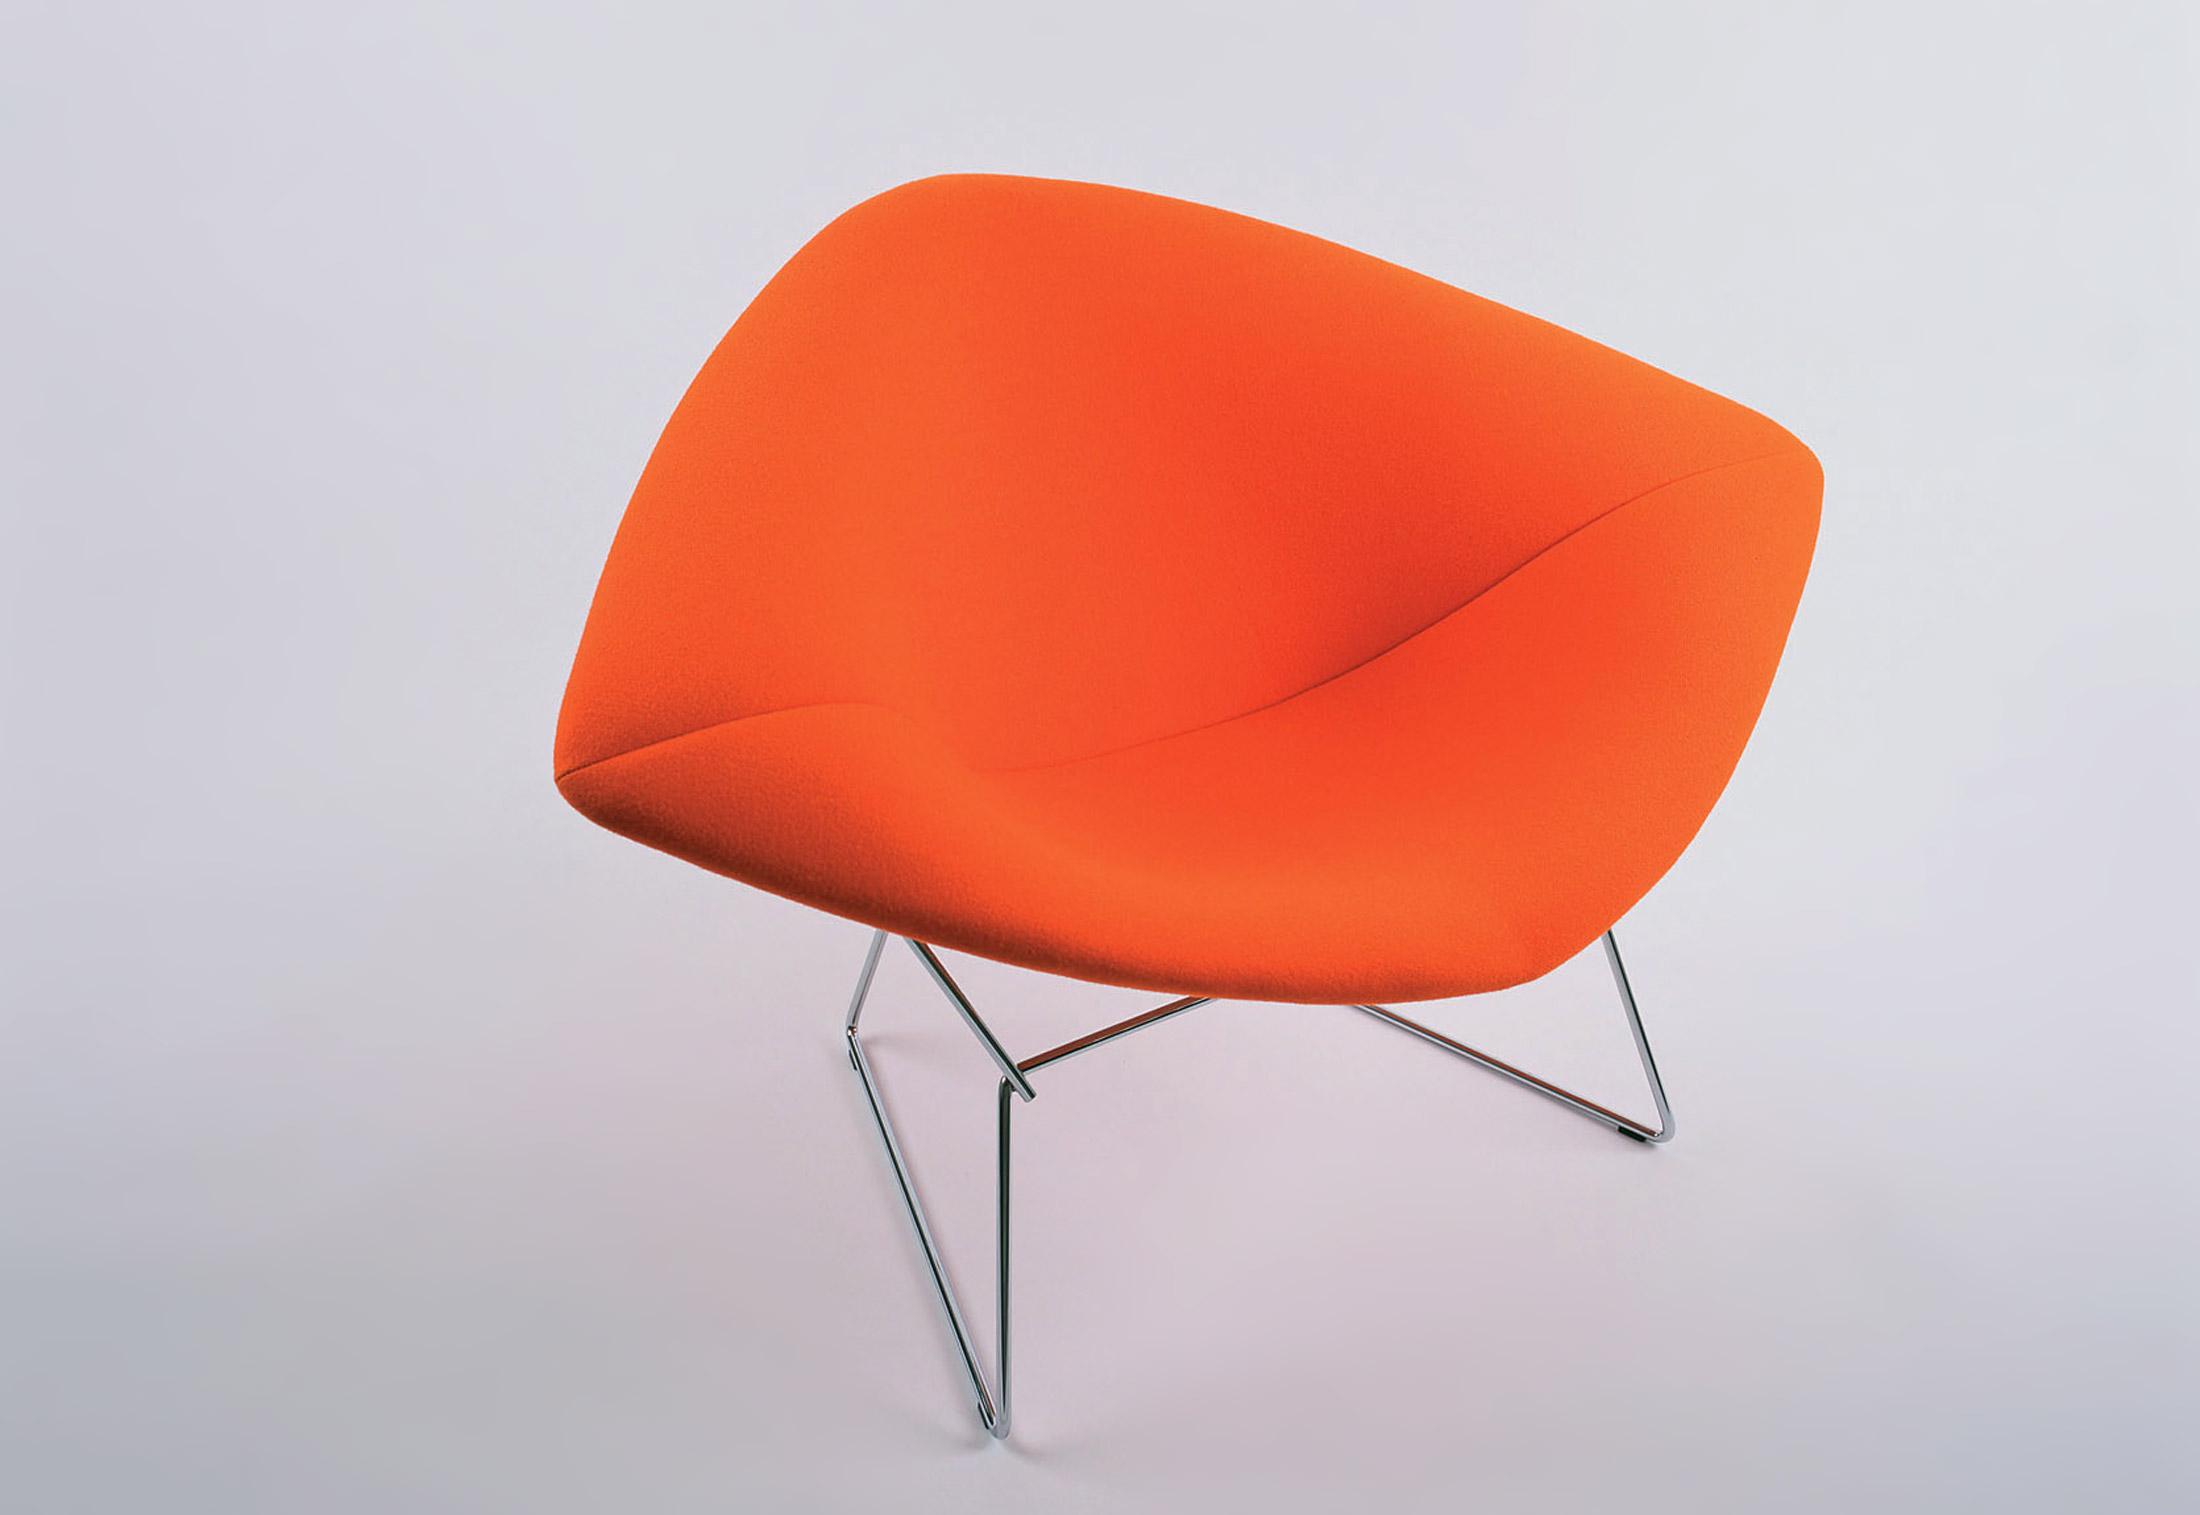 Bertoia Diamond Lounge Chair small by Knoll